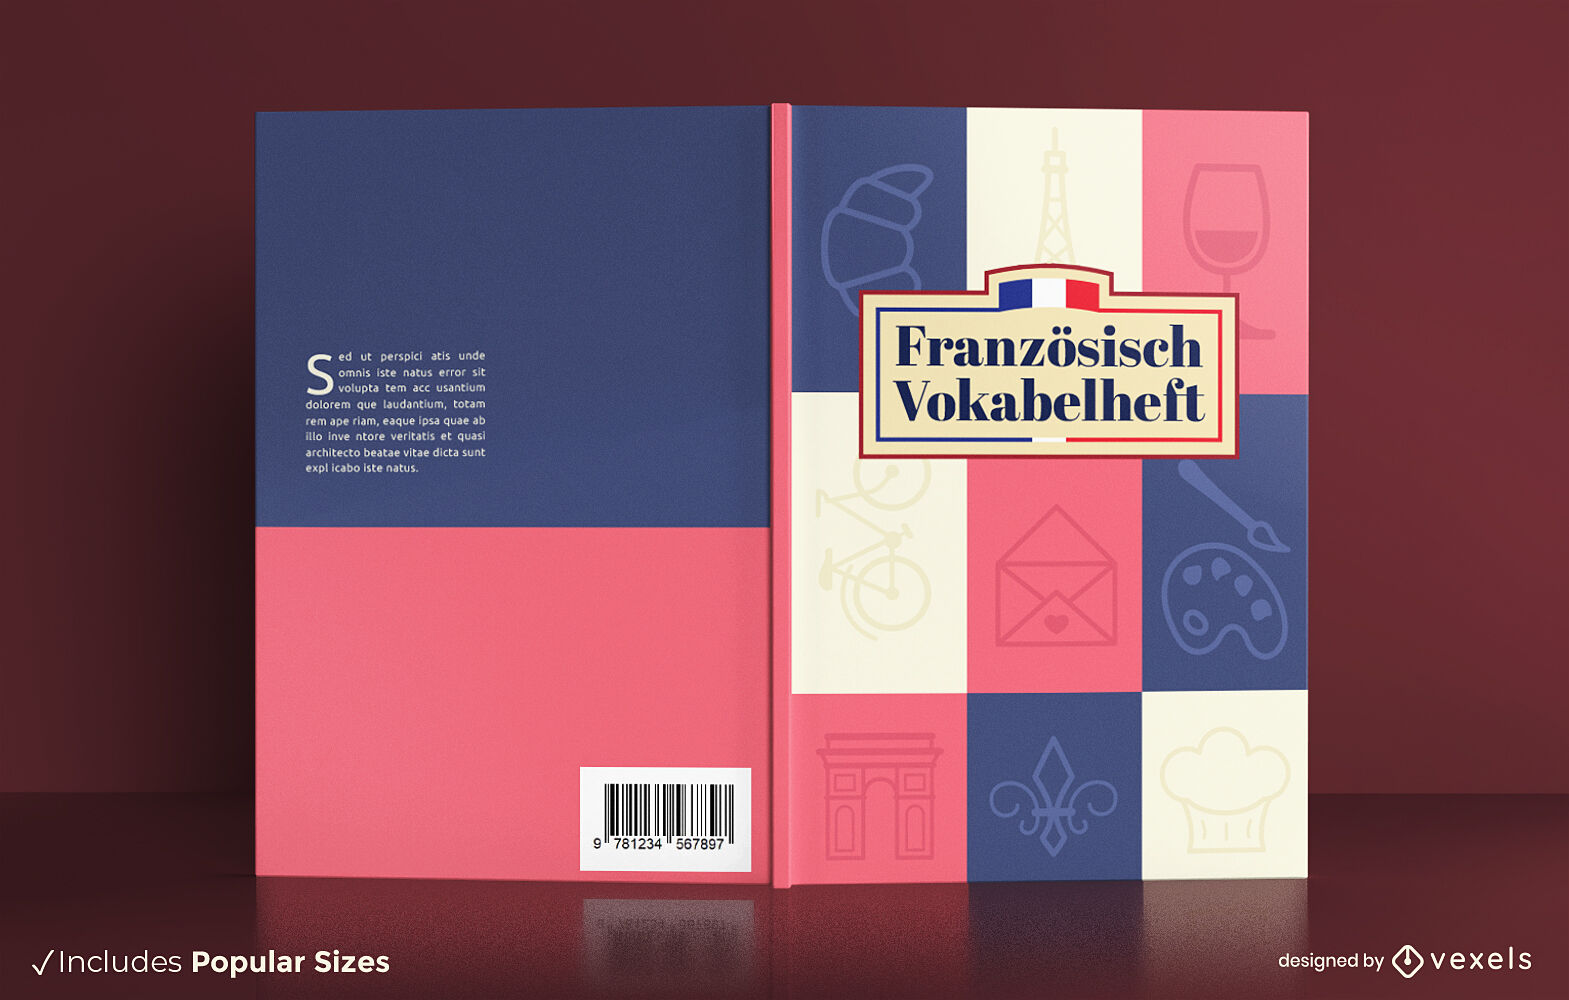 Diseño de portada de libro de elementos de cultura francesa.